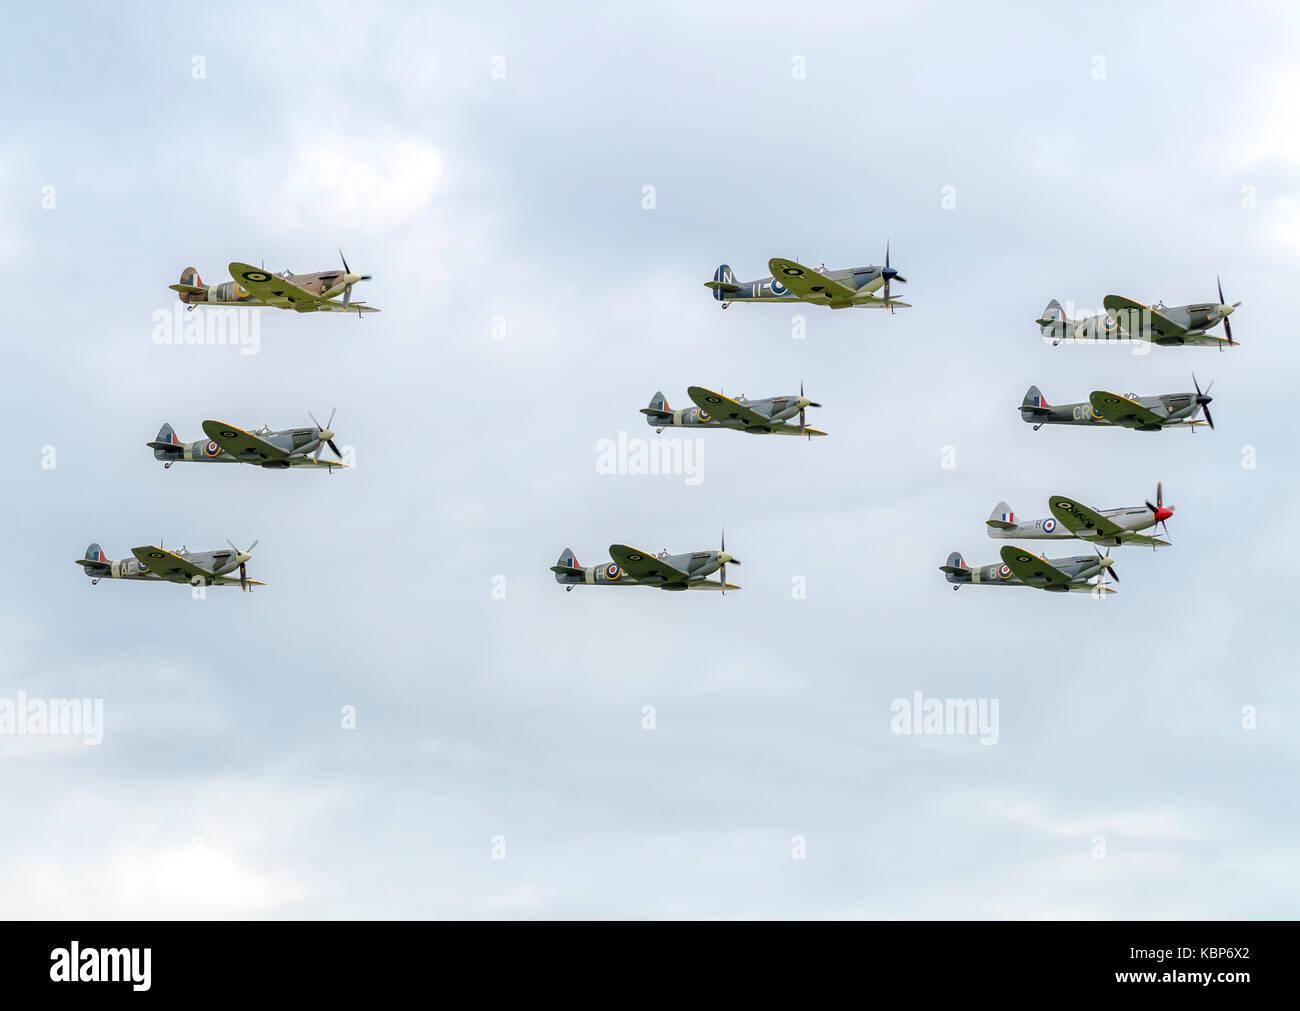 Air Show WW2 Planes - Stock Image